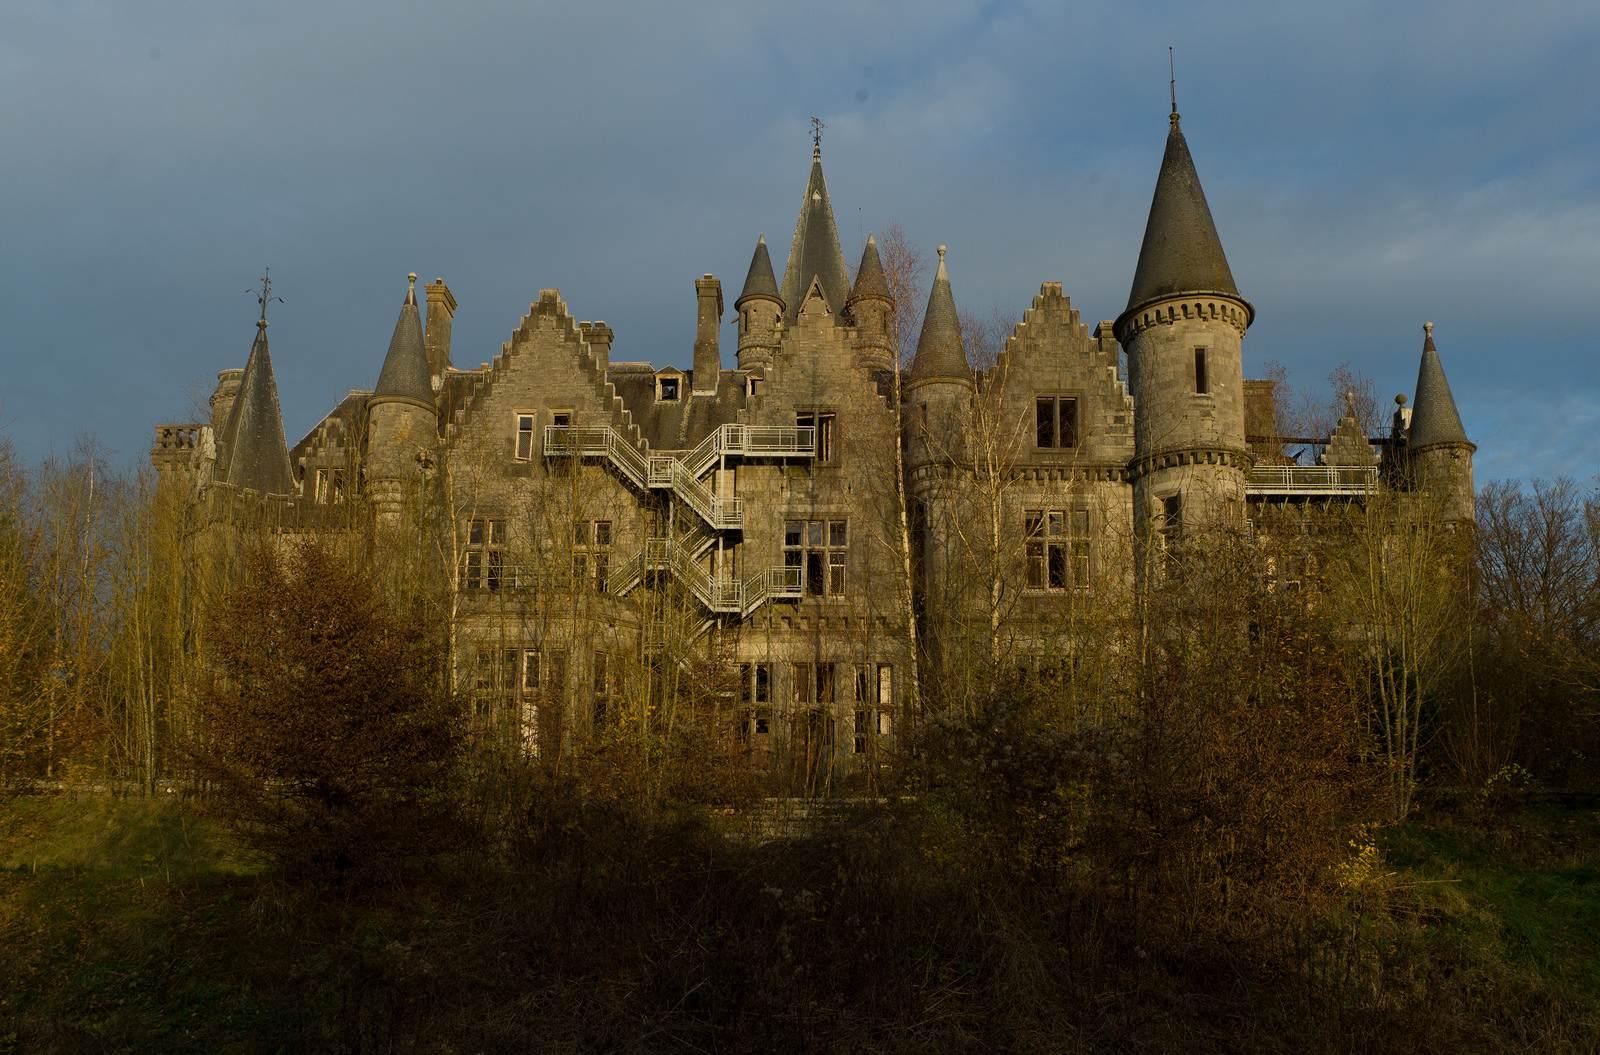 castle miranda The Abandoned Castle Miranda, Belgium